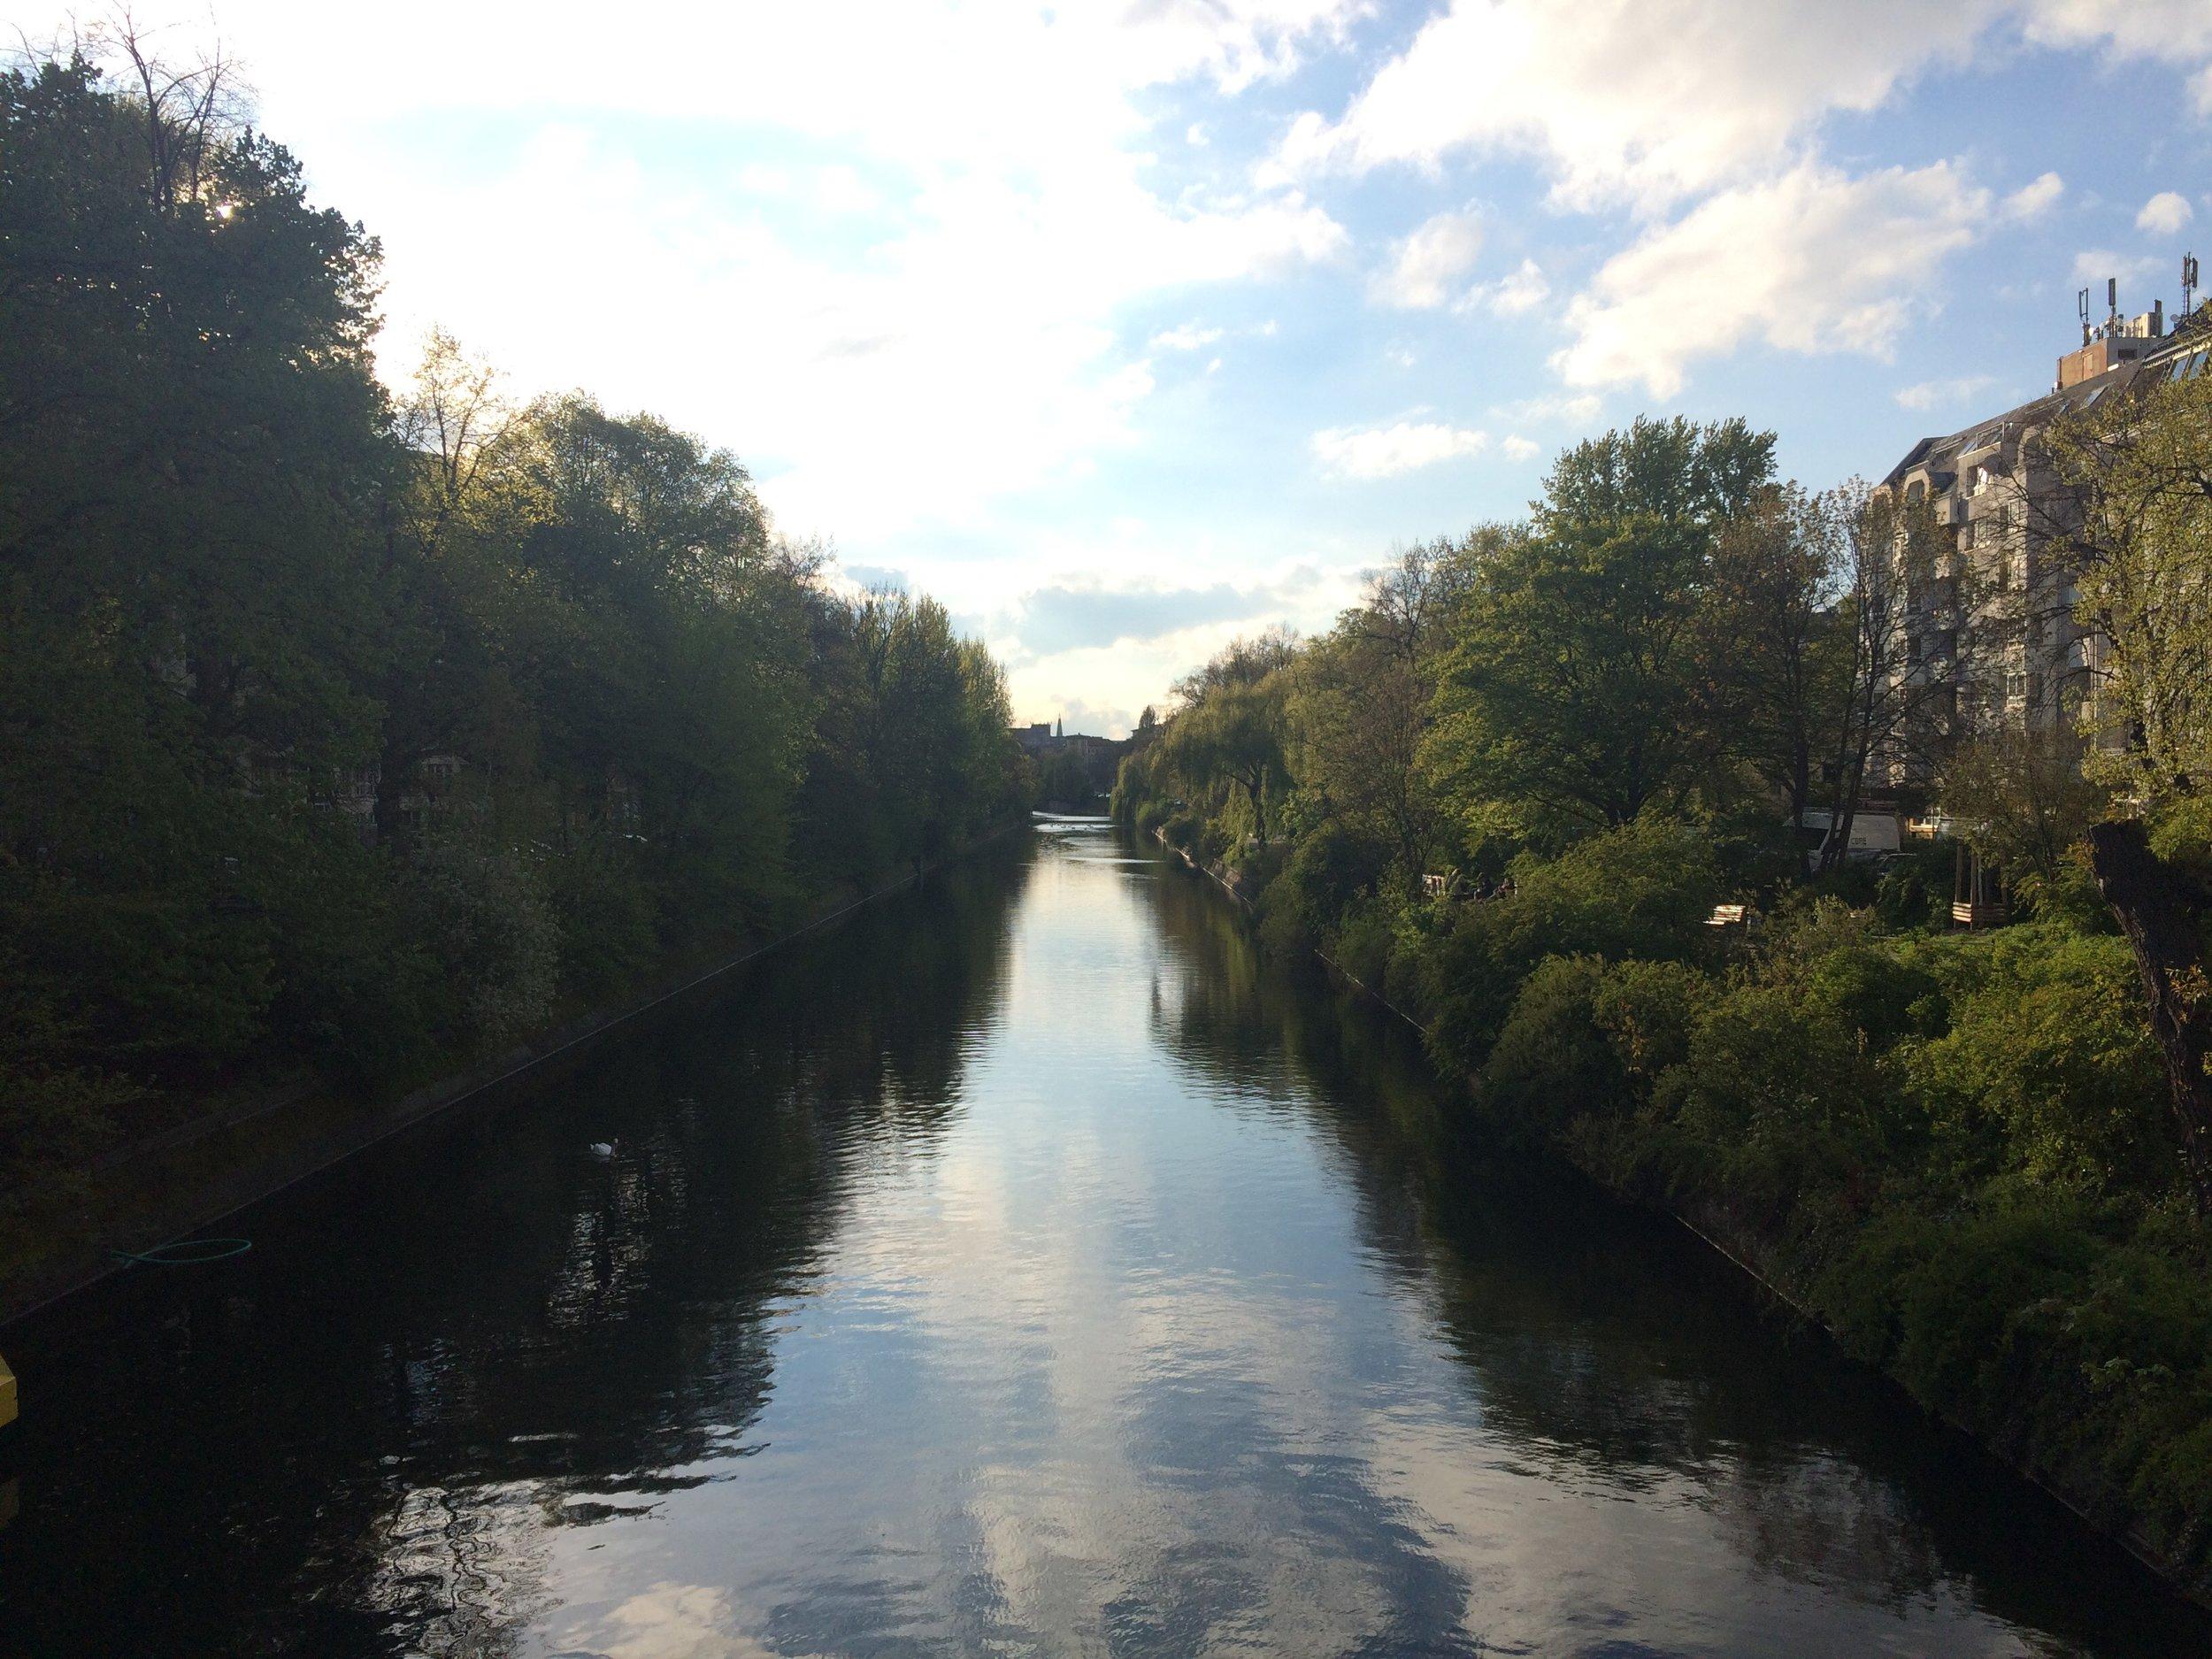 Spree Canal / Kreuzberg, Berlin / Germany |Copyright Alexis Rockley, Local (Tourist)